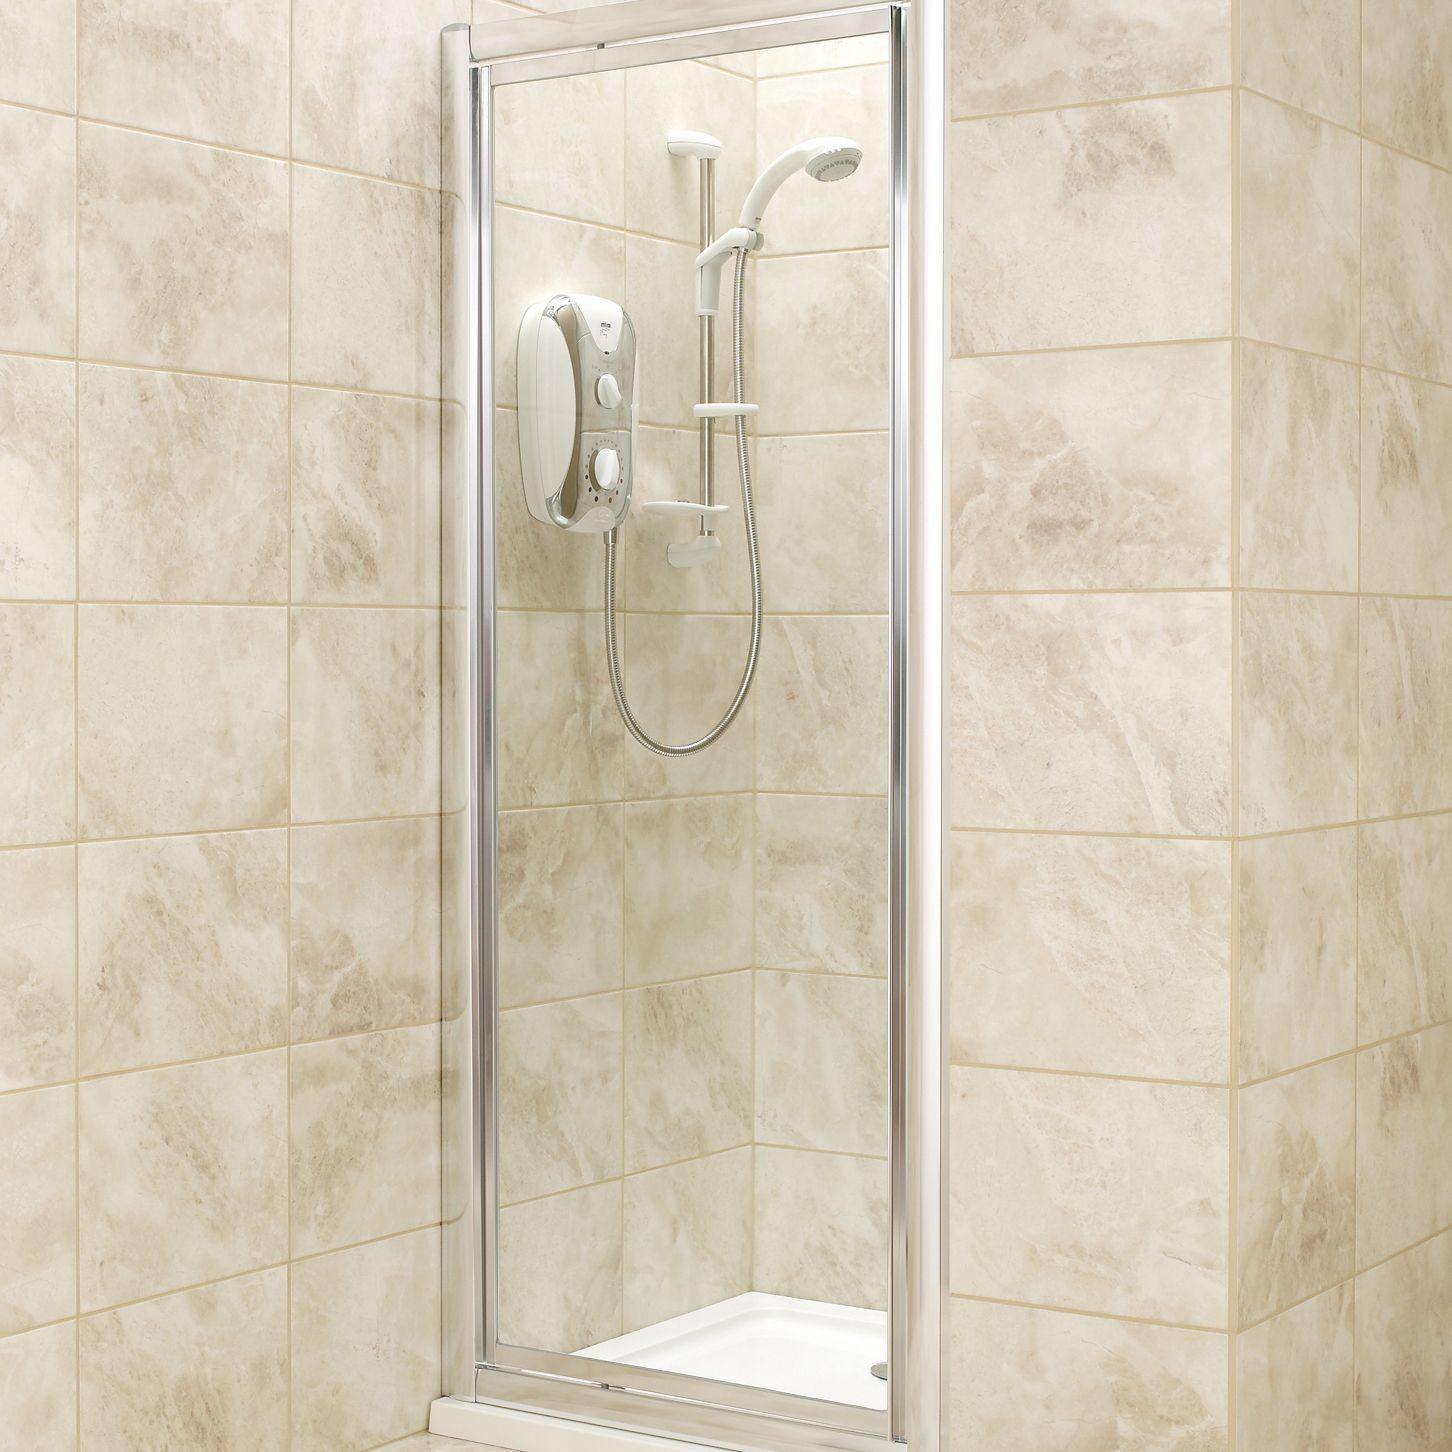 B Amp Q Square Shower Enclosure With Pivot Door W 760mm D